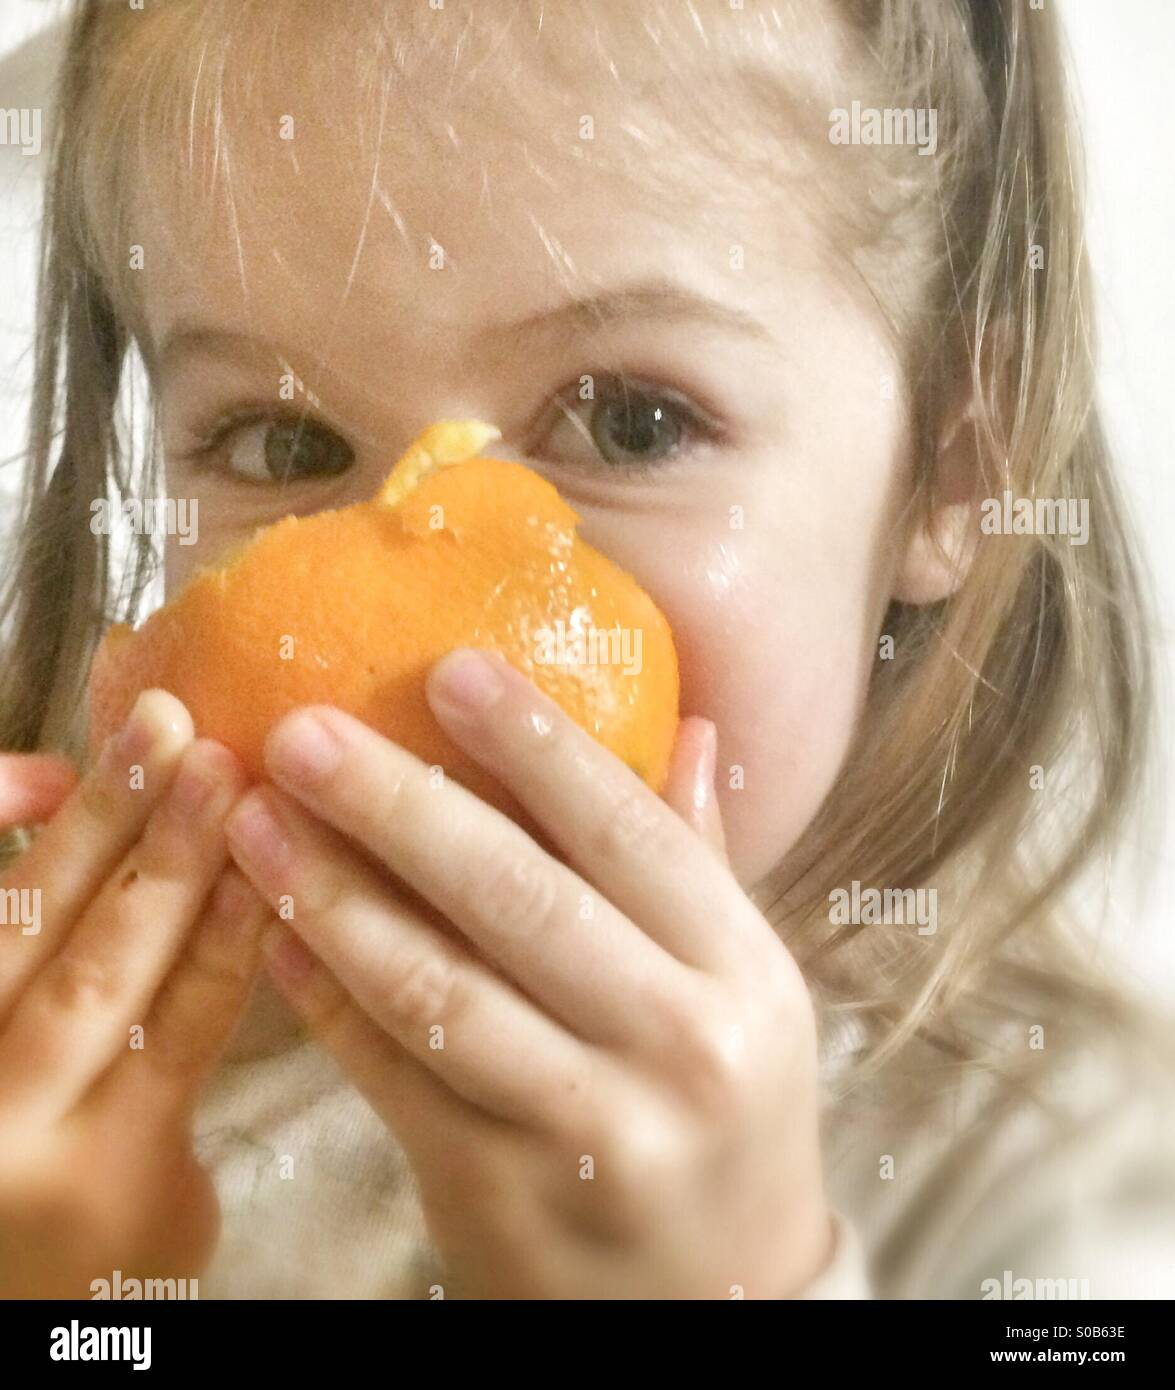 Kleinkind isst Orange Stockbild